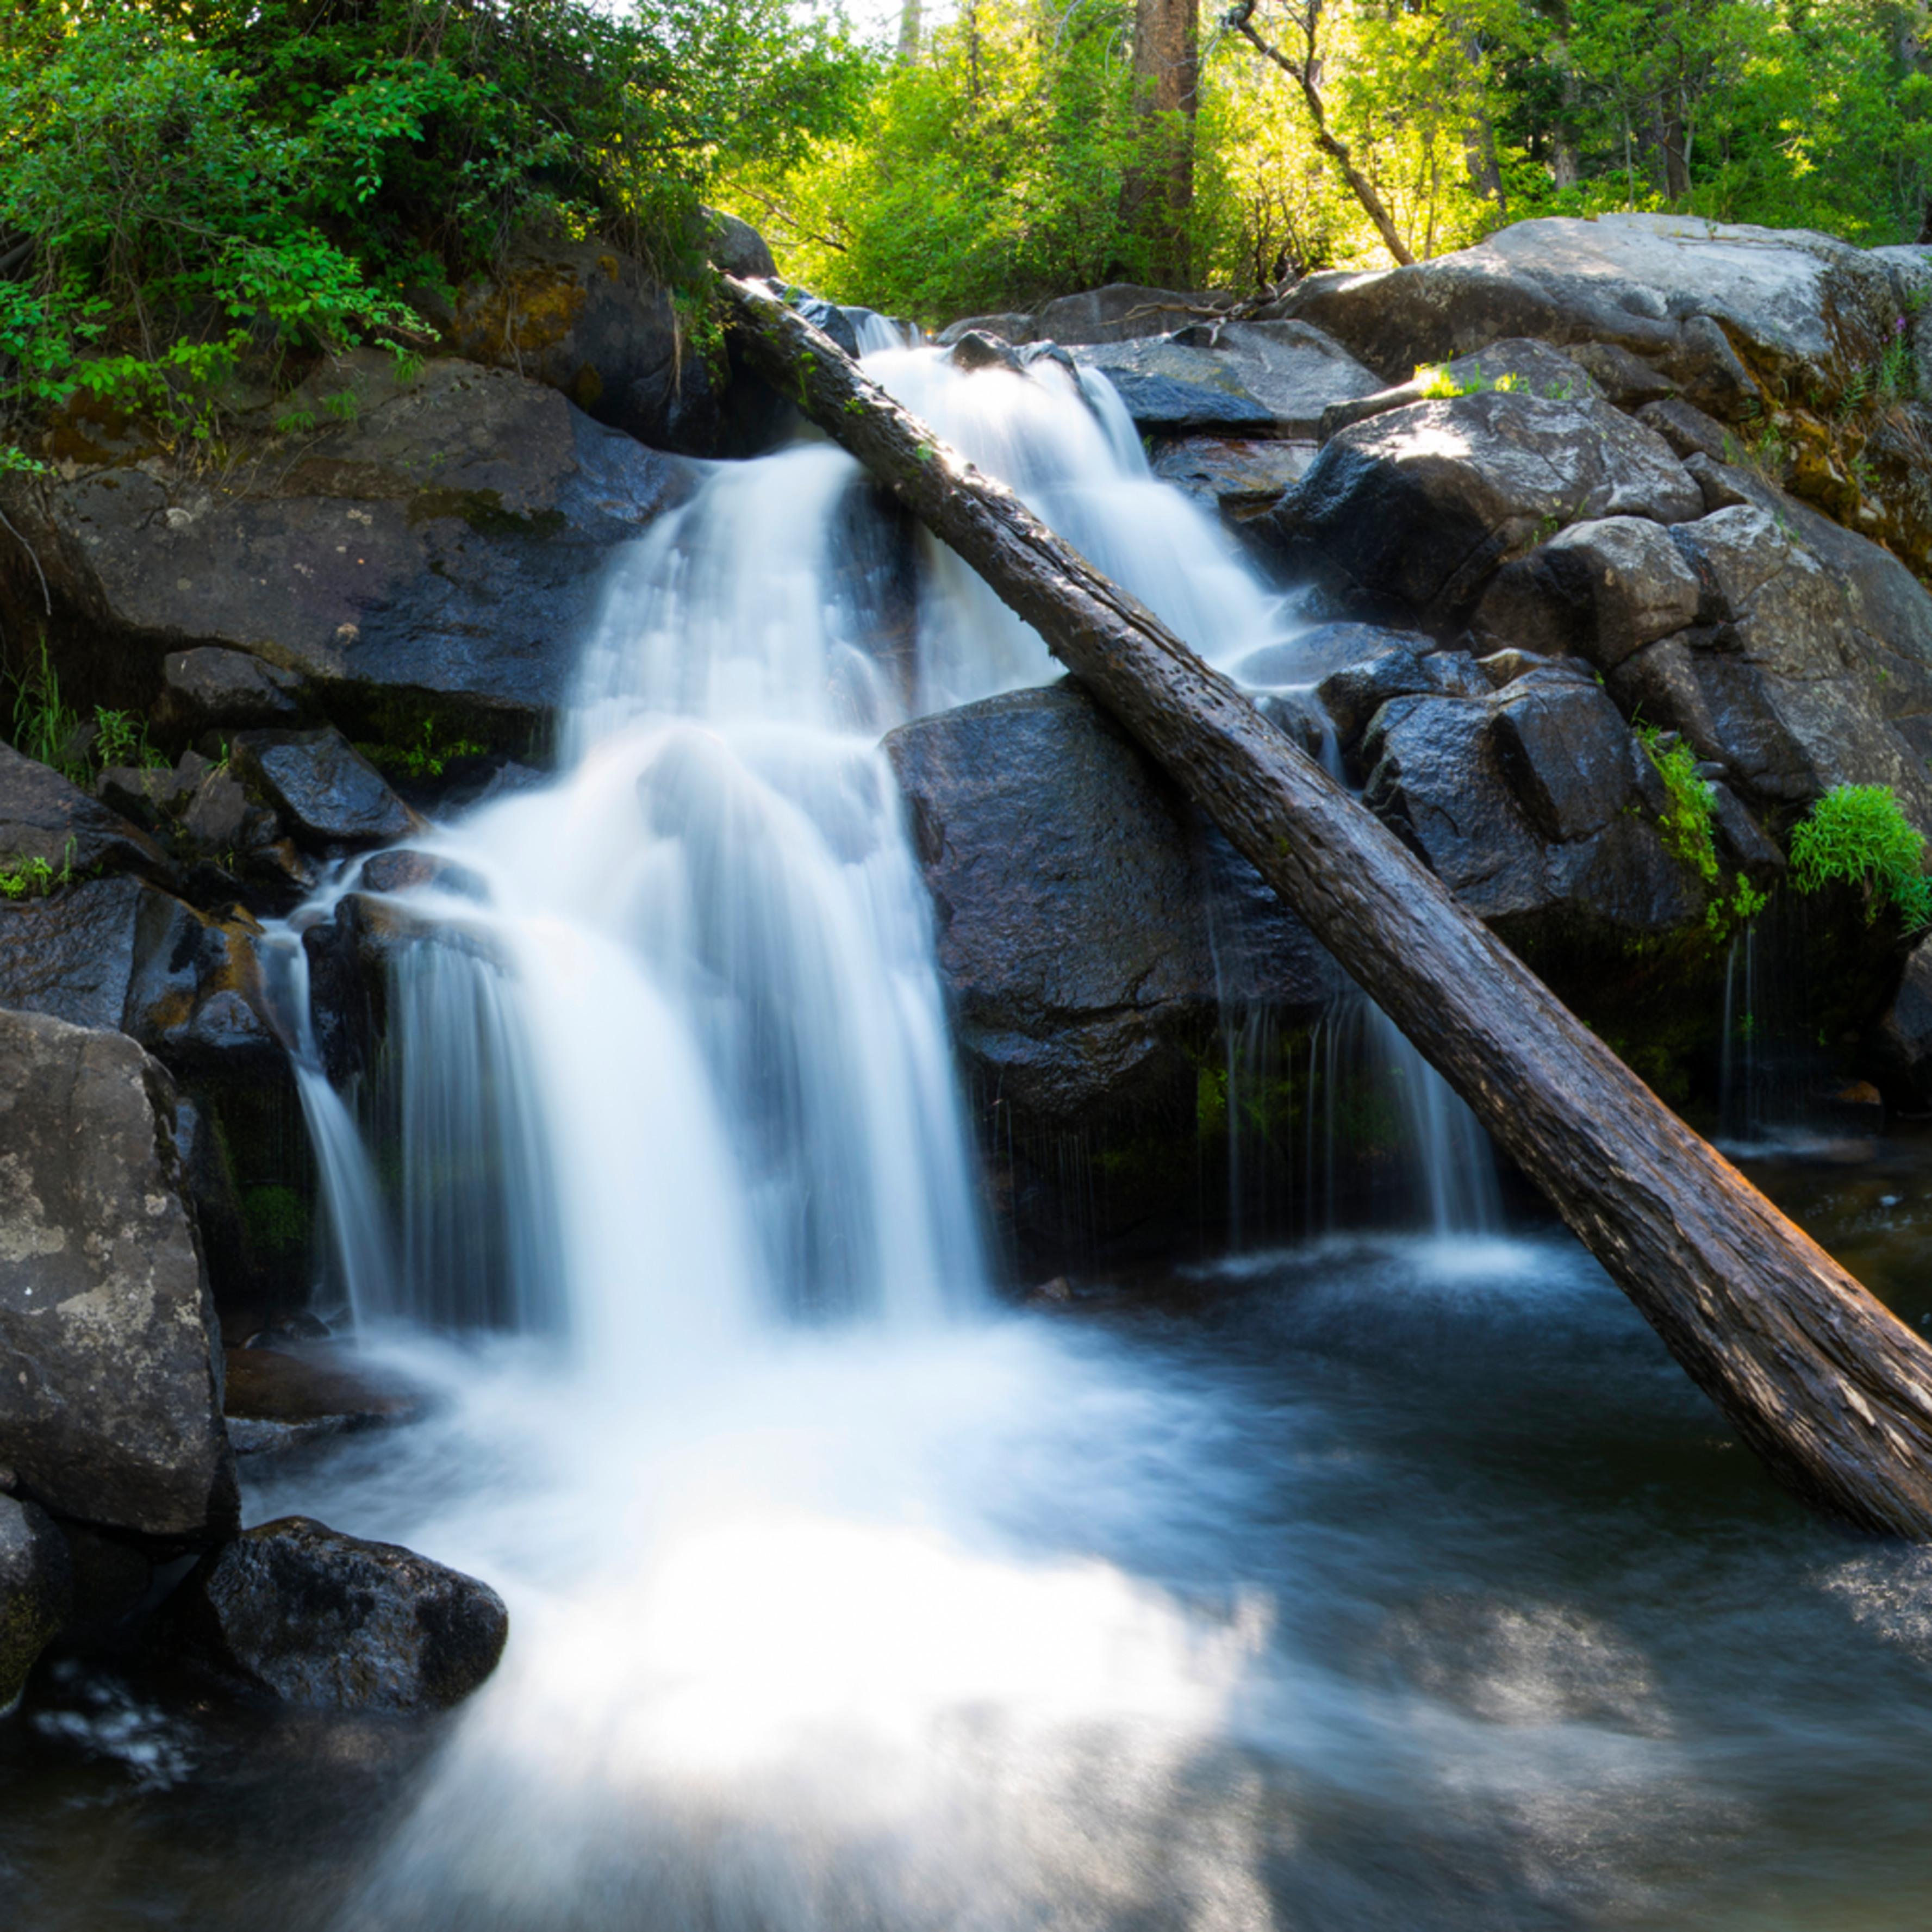 South upper truckee waterfall dwtvv2